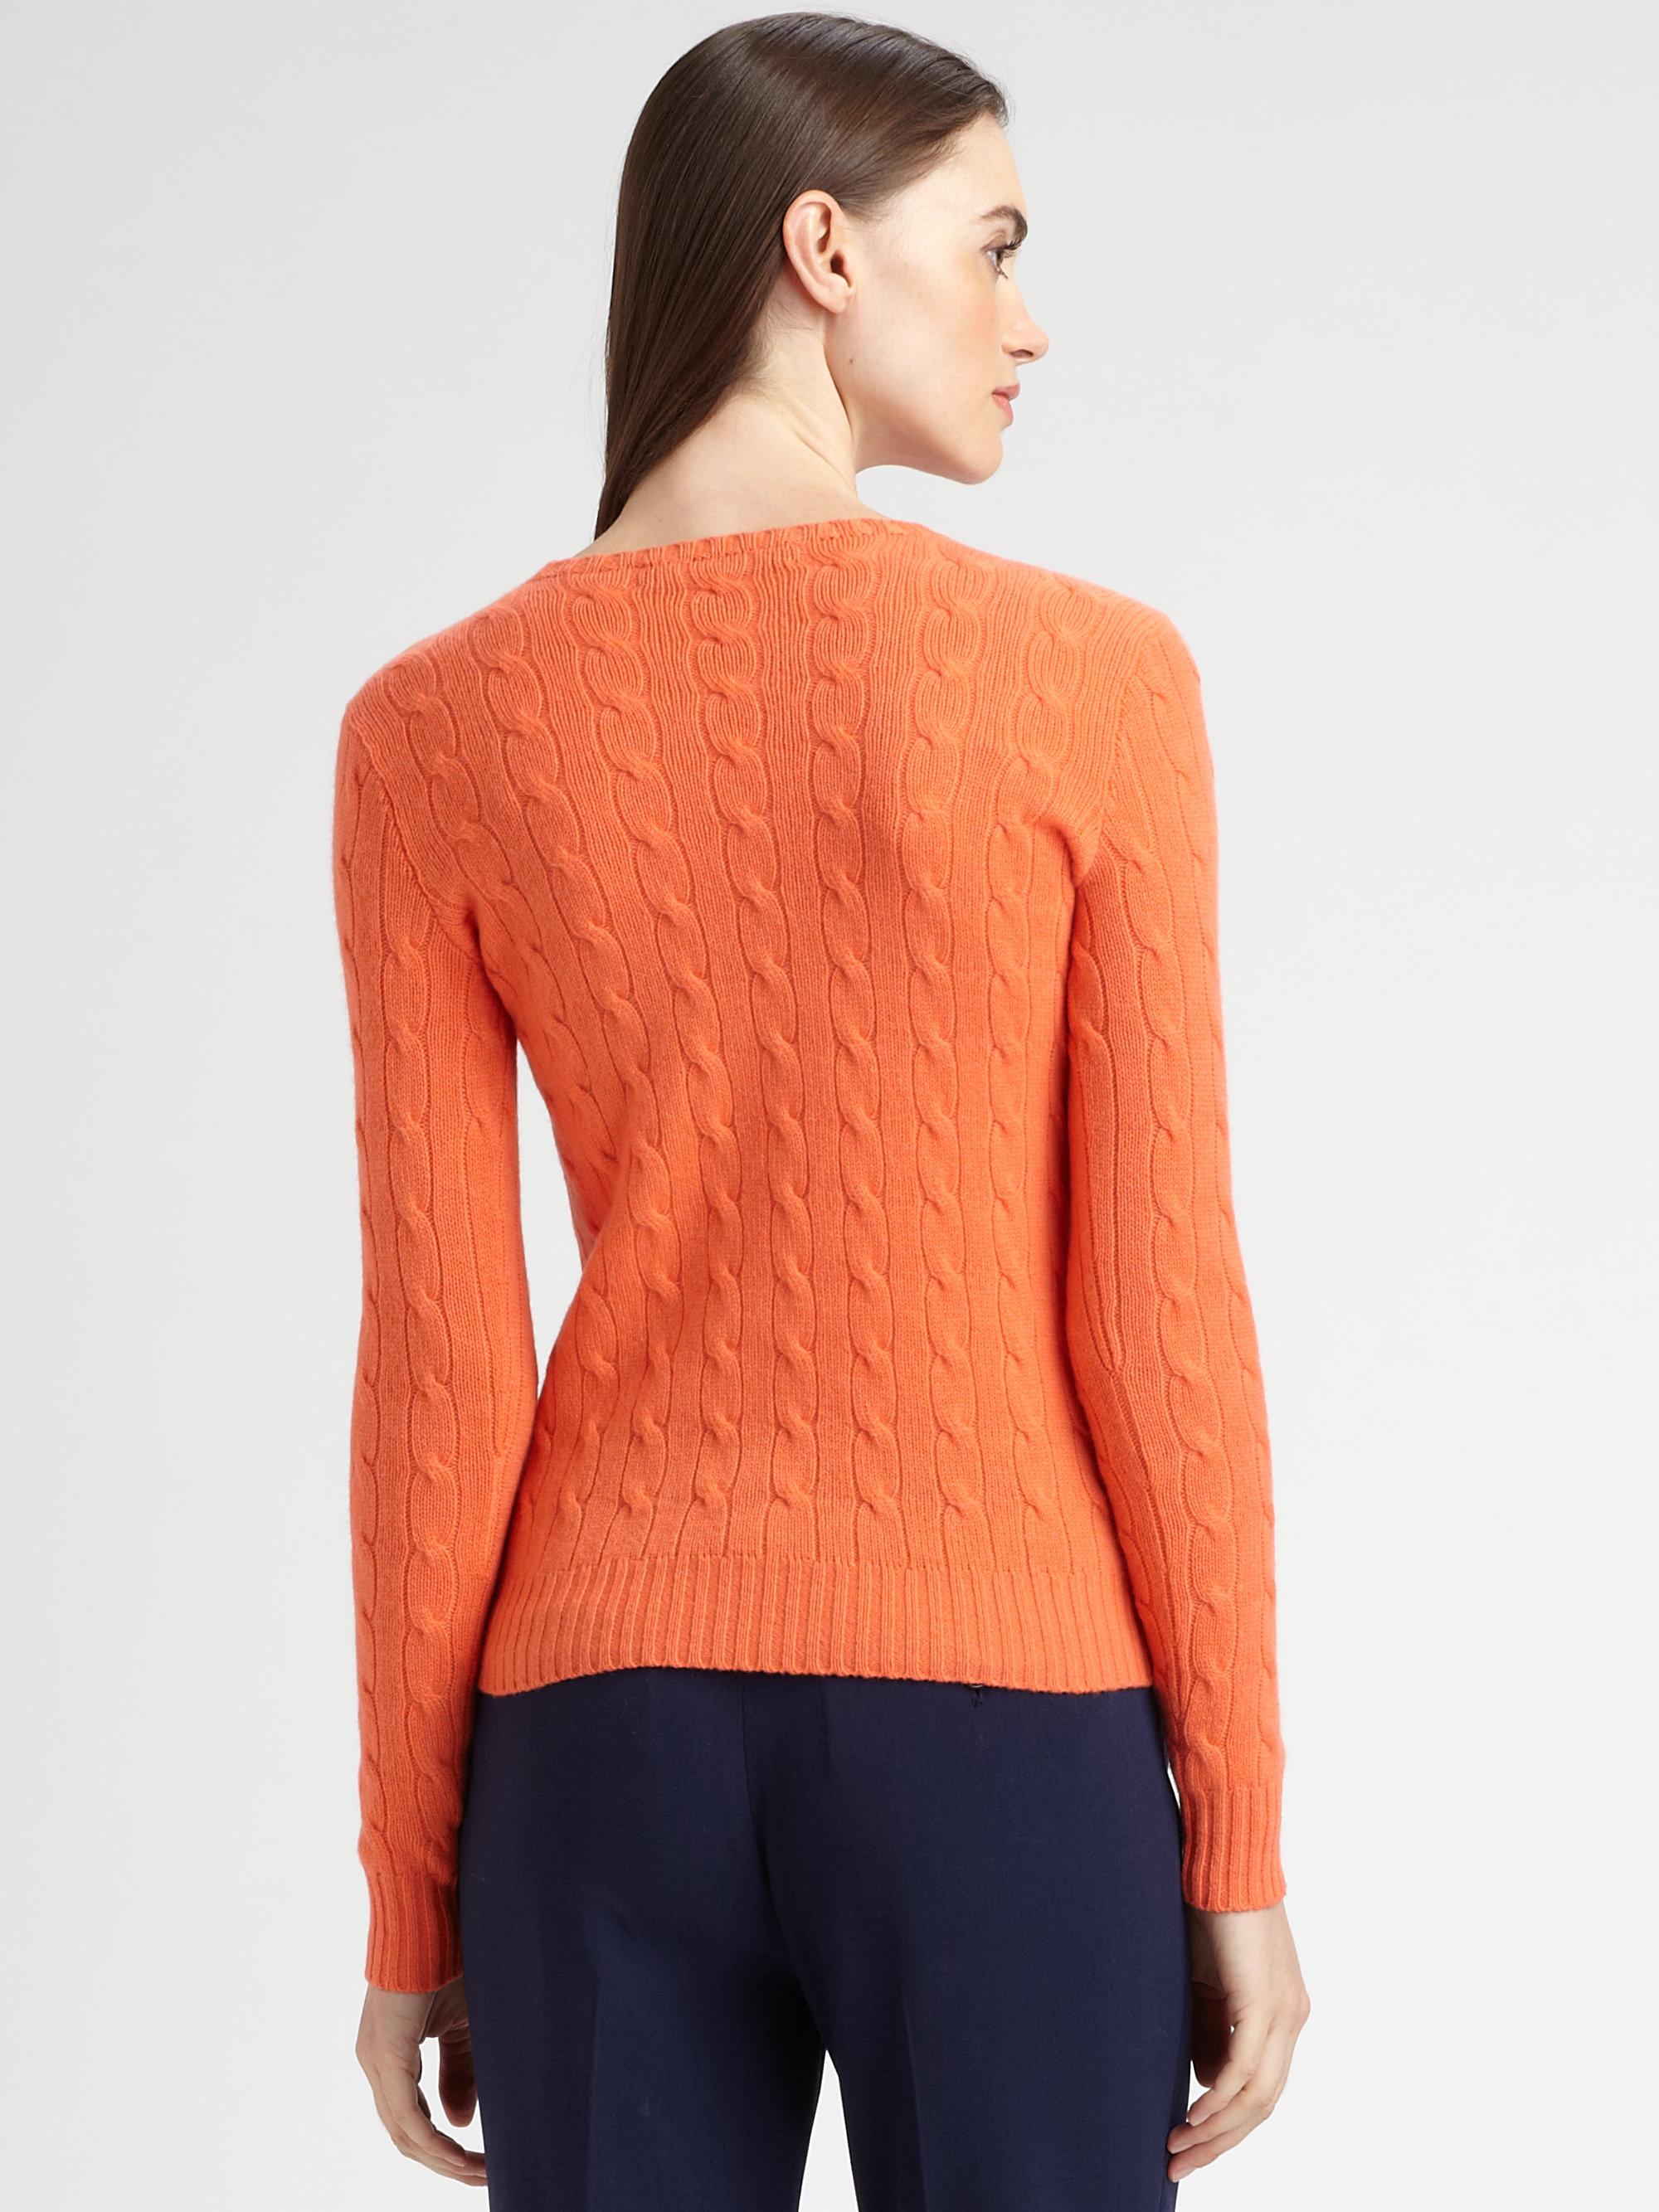 d9bcaf2e1 Ralph Lauren Black Label Cashmere Cableknit Crewneck Sweater in ...